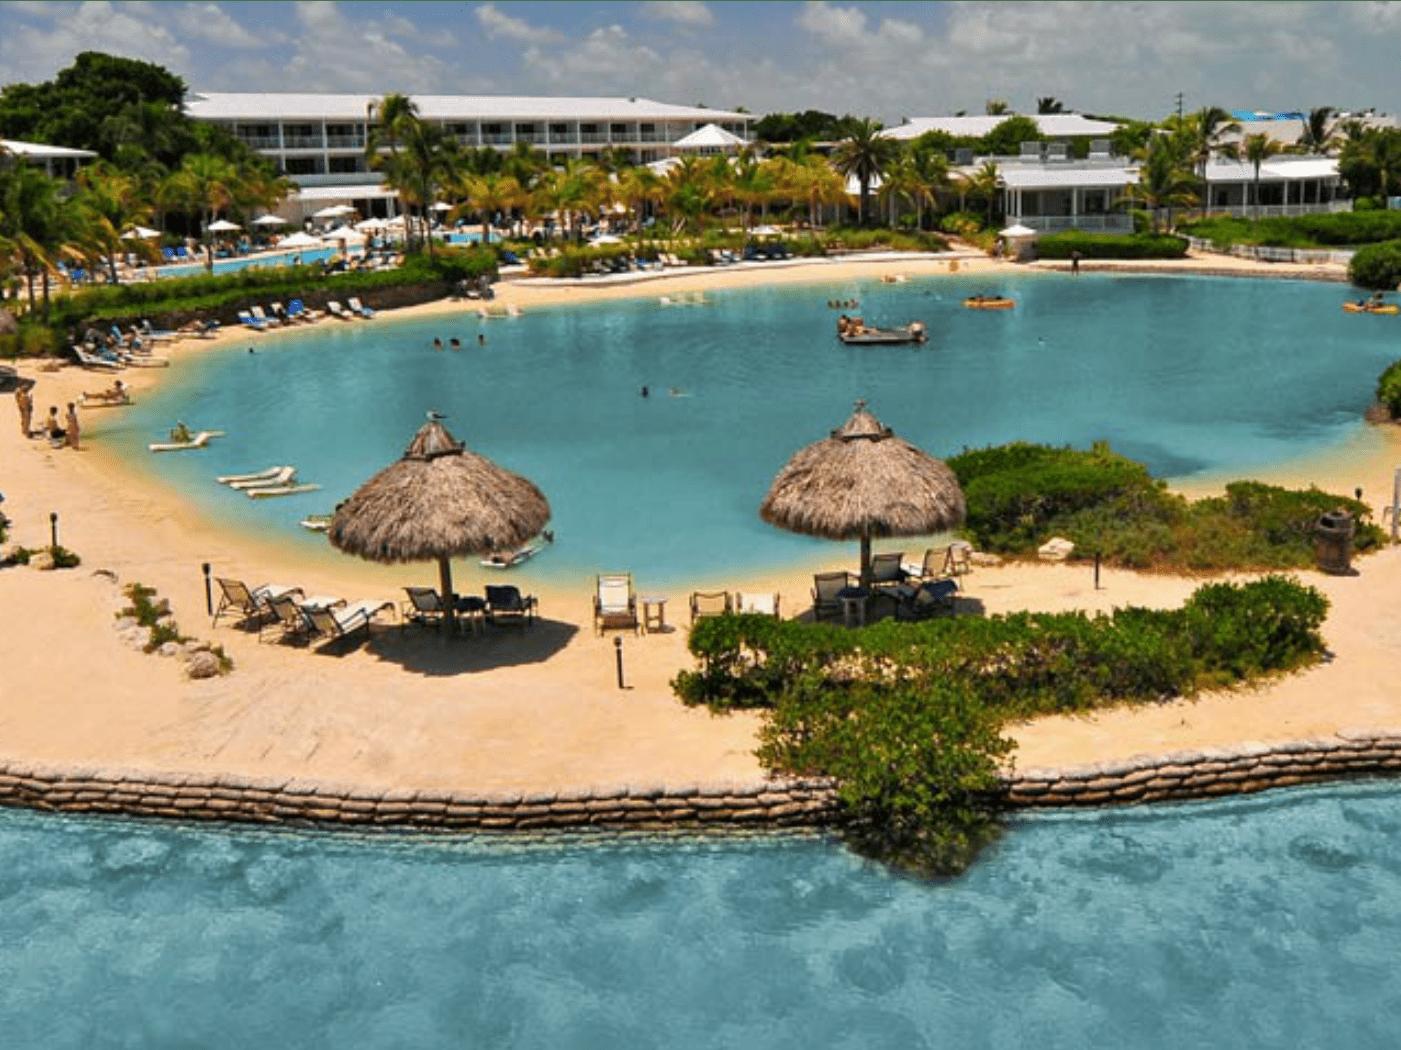 Saltwater Lagoon at Hawk's Cay Resort